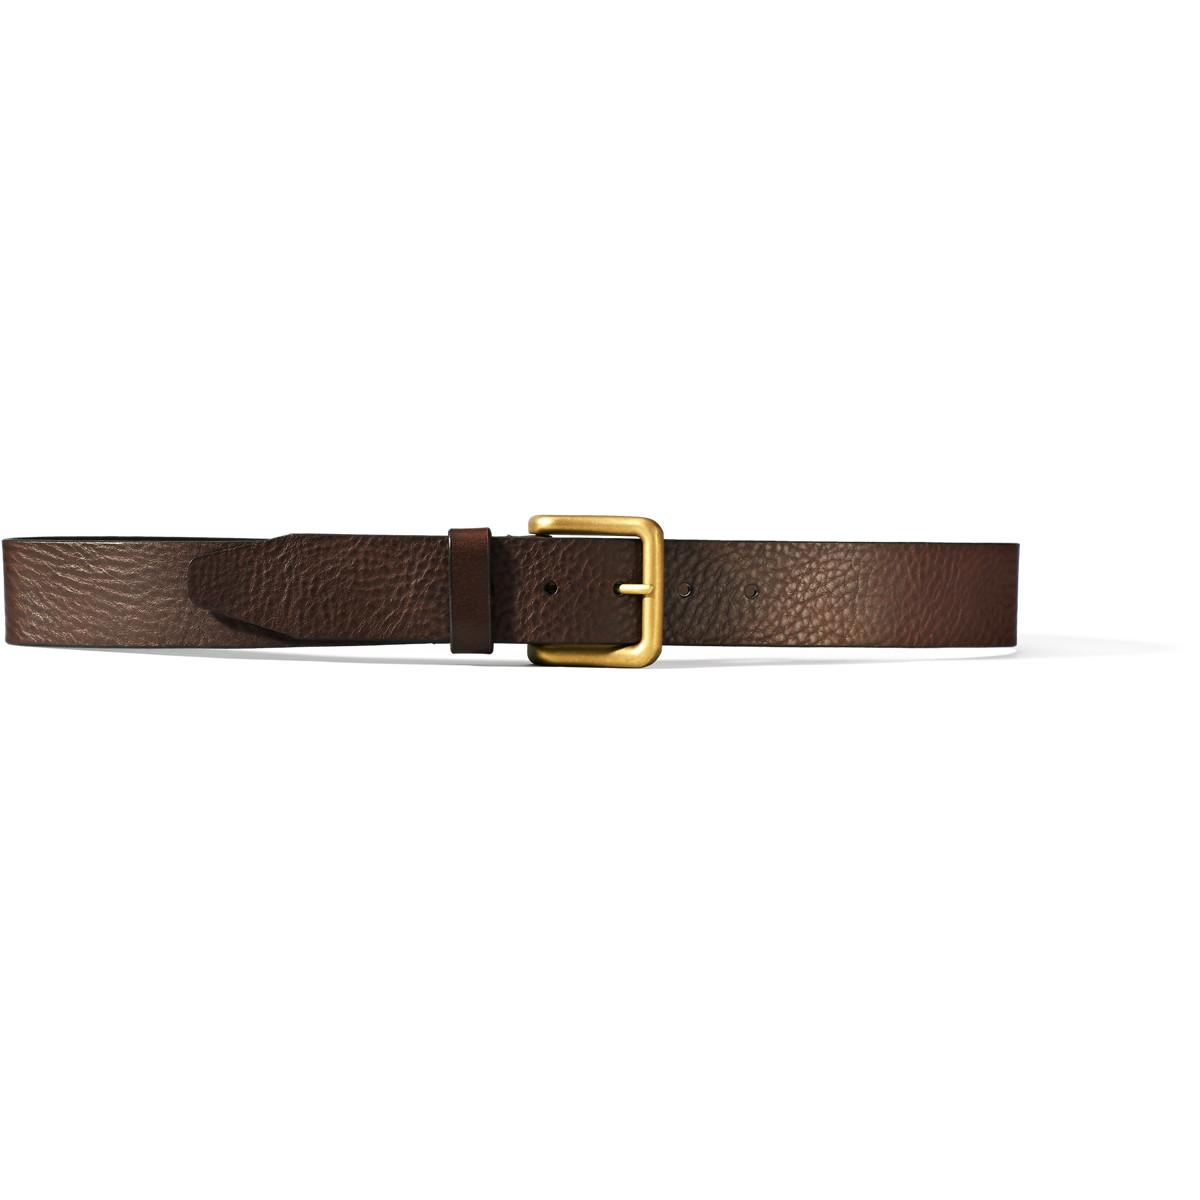 Danner Catch & Release Belt - Brown w/ Brass